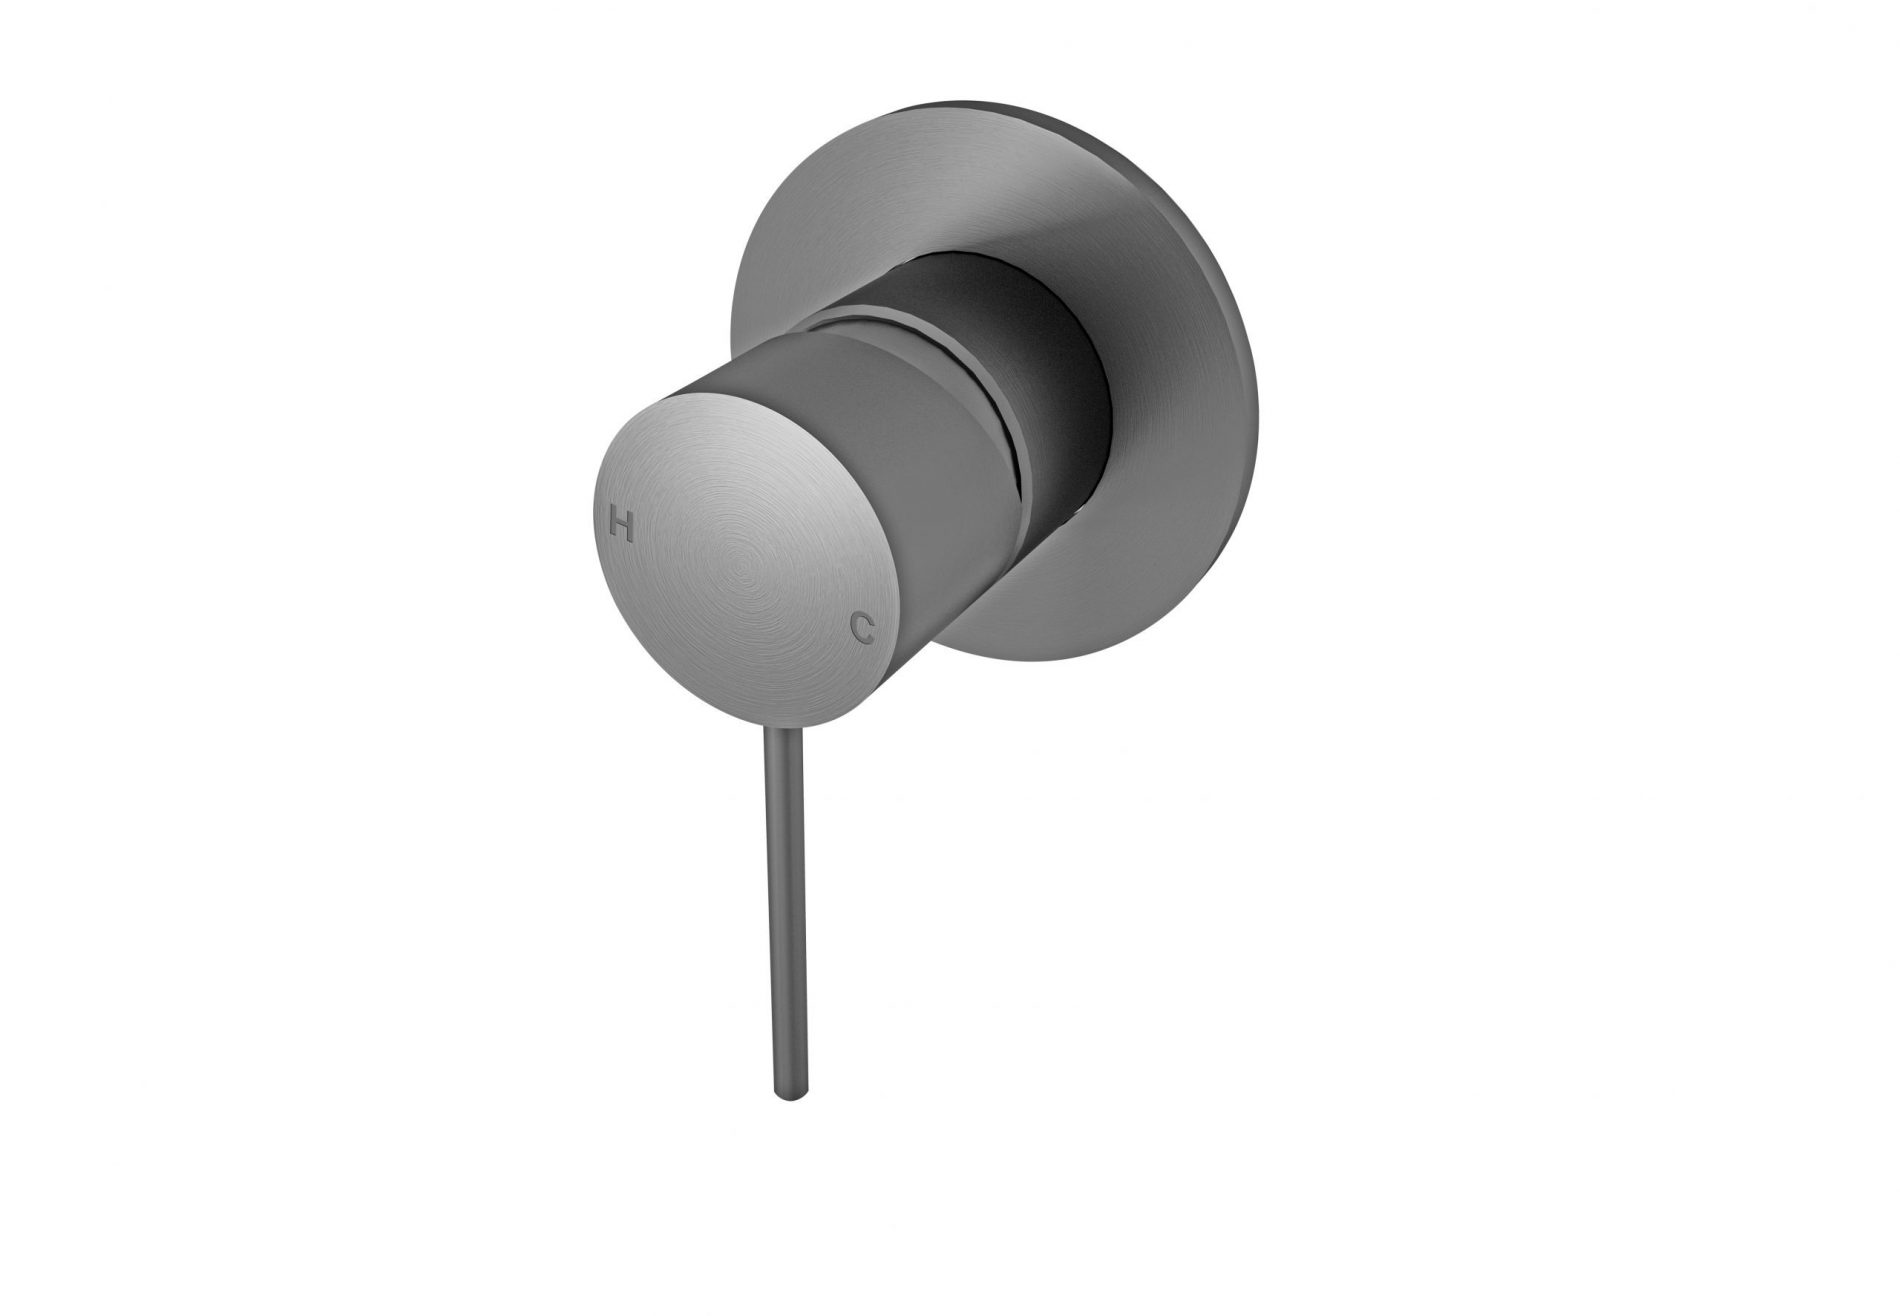 Nero Mecca Shower Wall Mixer Gun Metal Grey